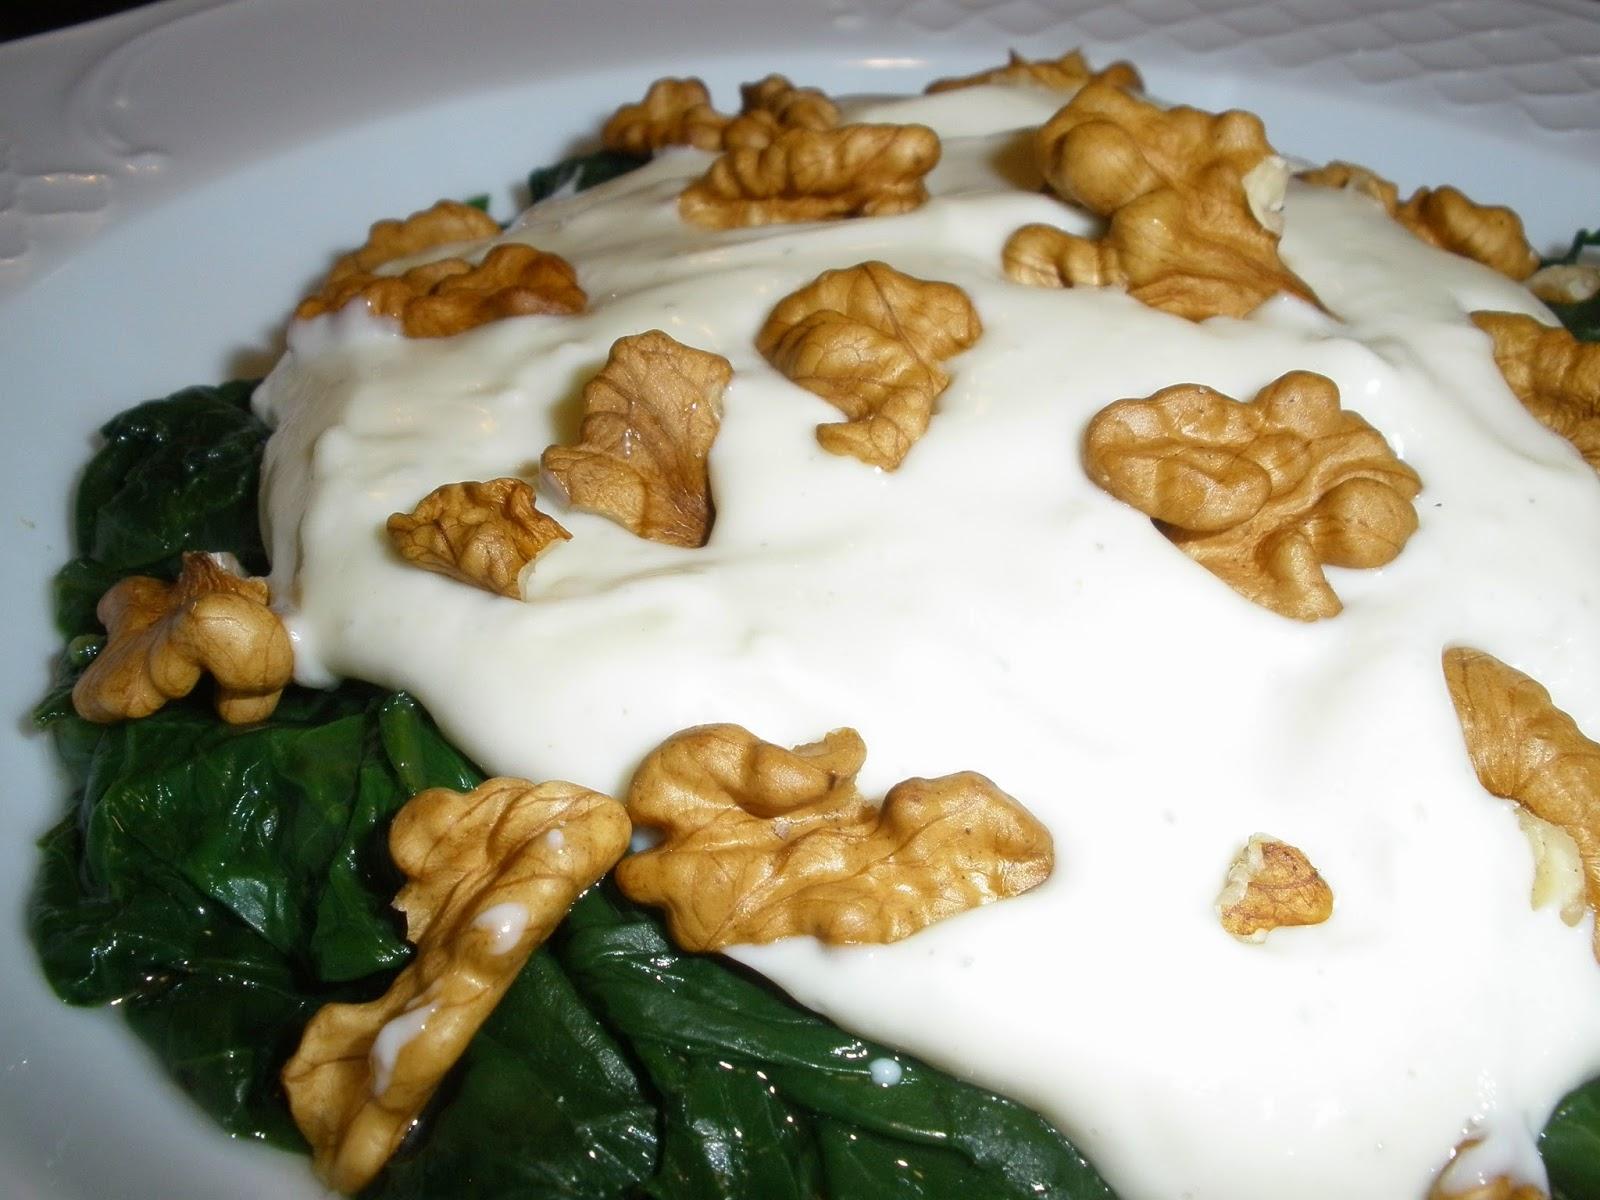 Receta espinacas congeladas cocinar en casa es for Cocinar espinacas